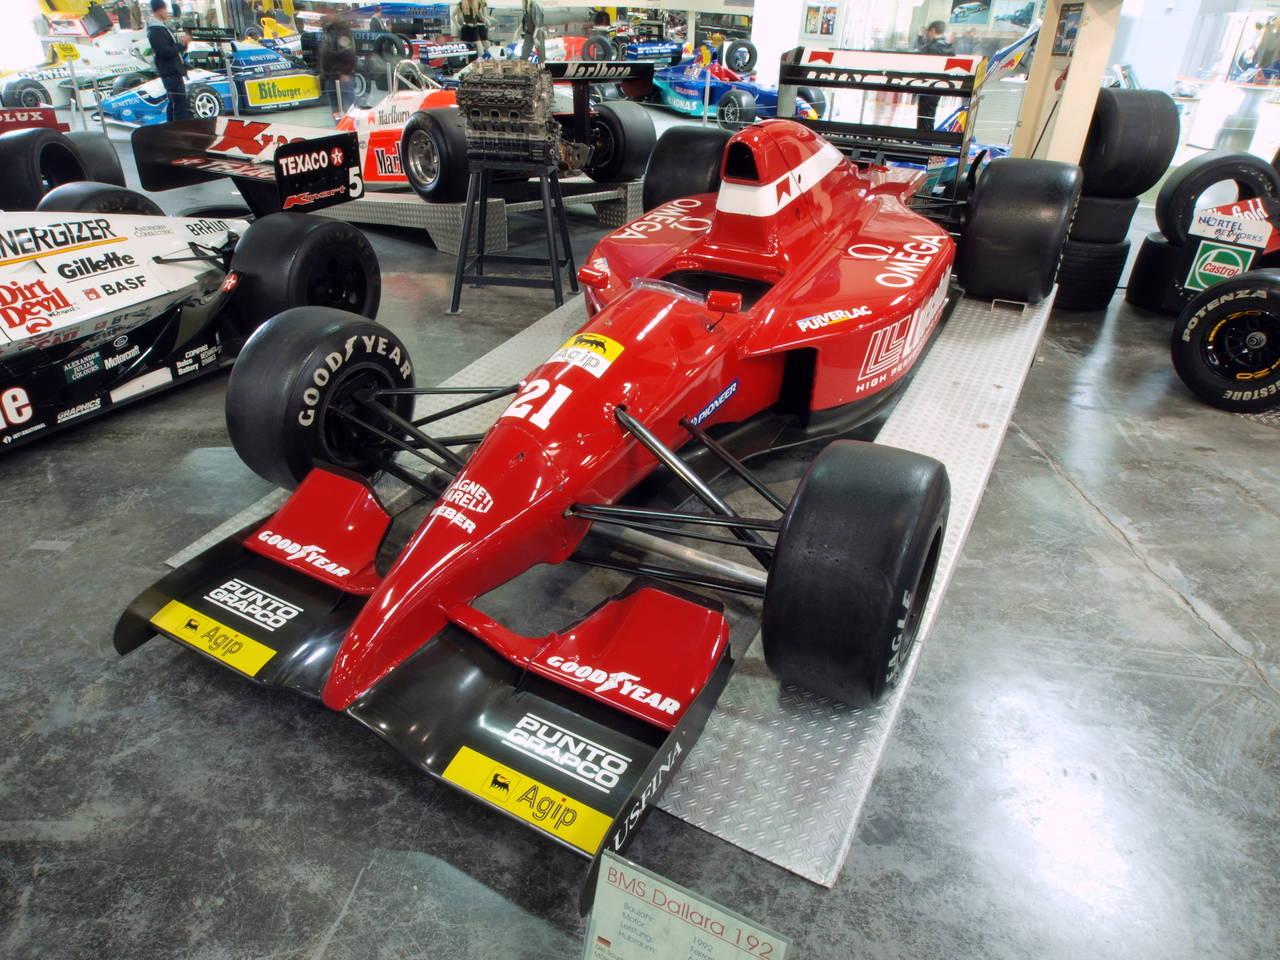 1992_BMS_Dallara_192_pic2